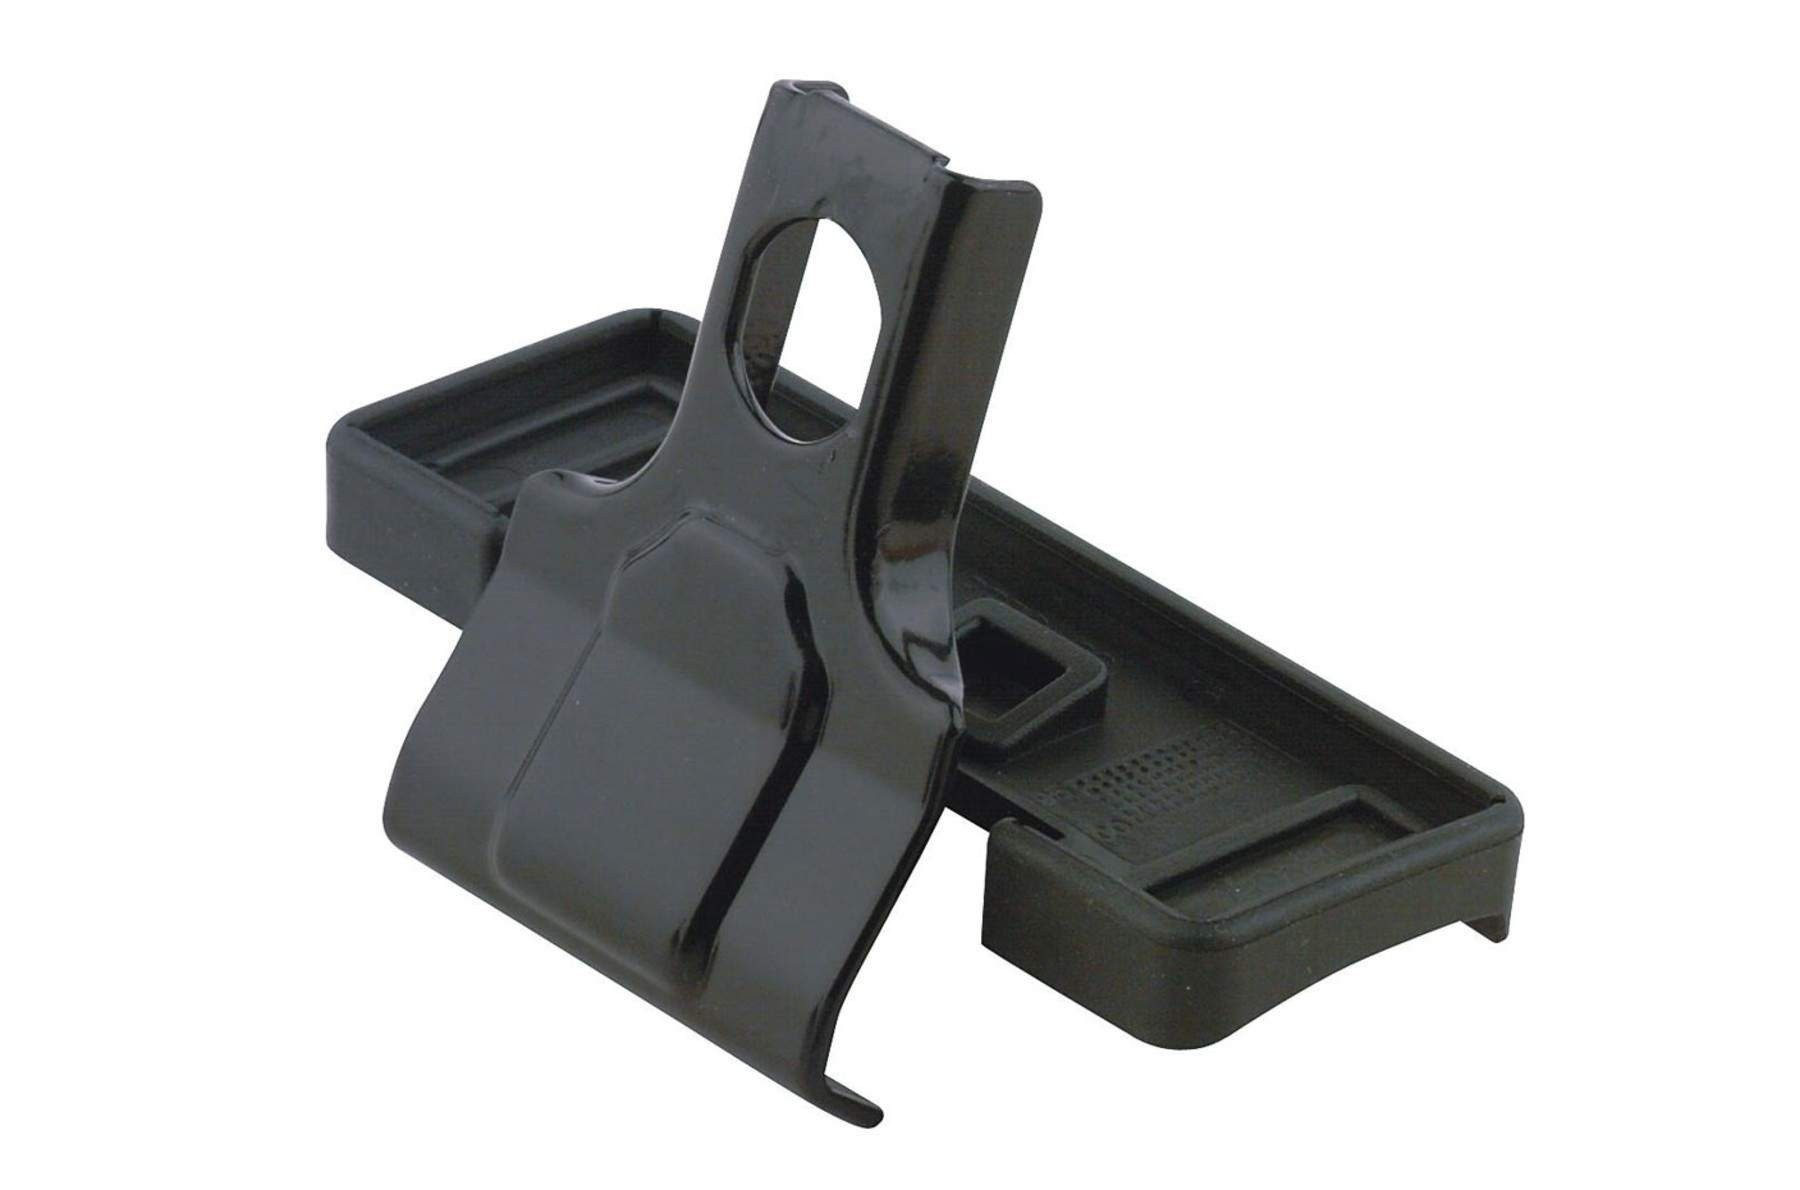 Адаптер для багажников THULE Mitsubishi Pajero Sport 1998-2006